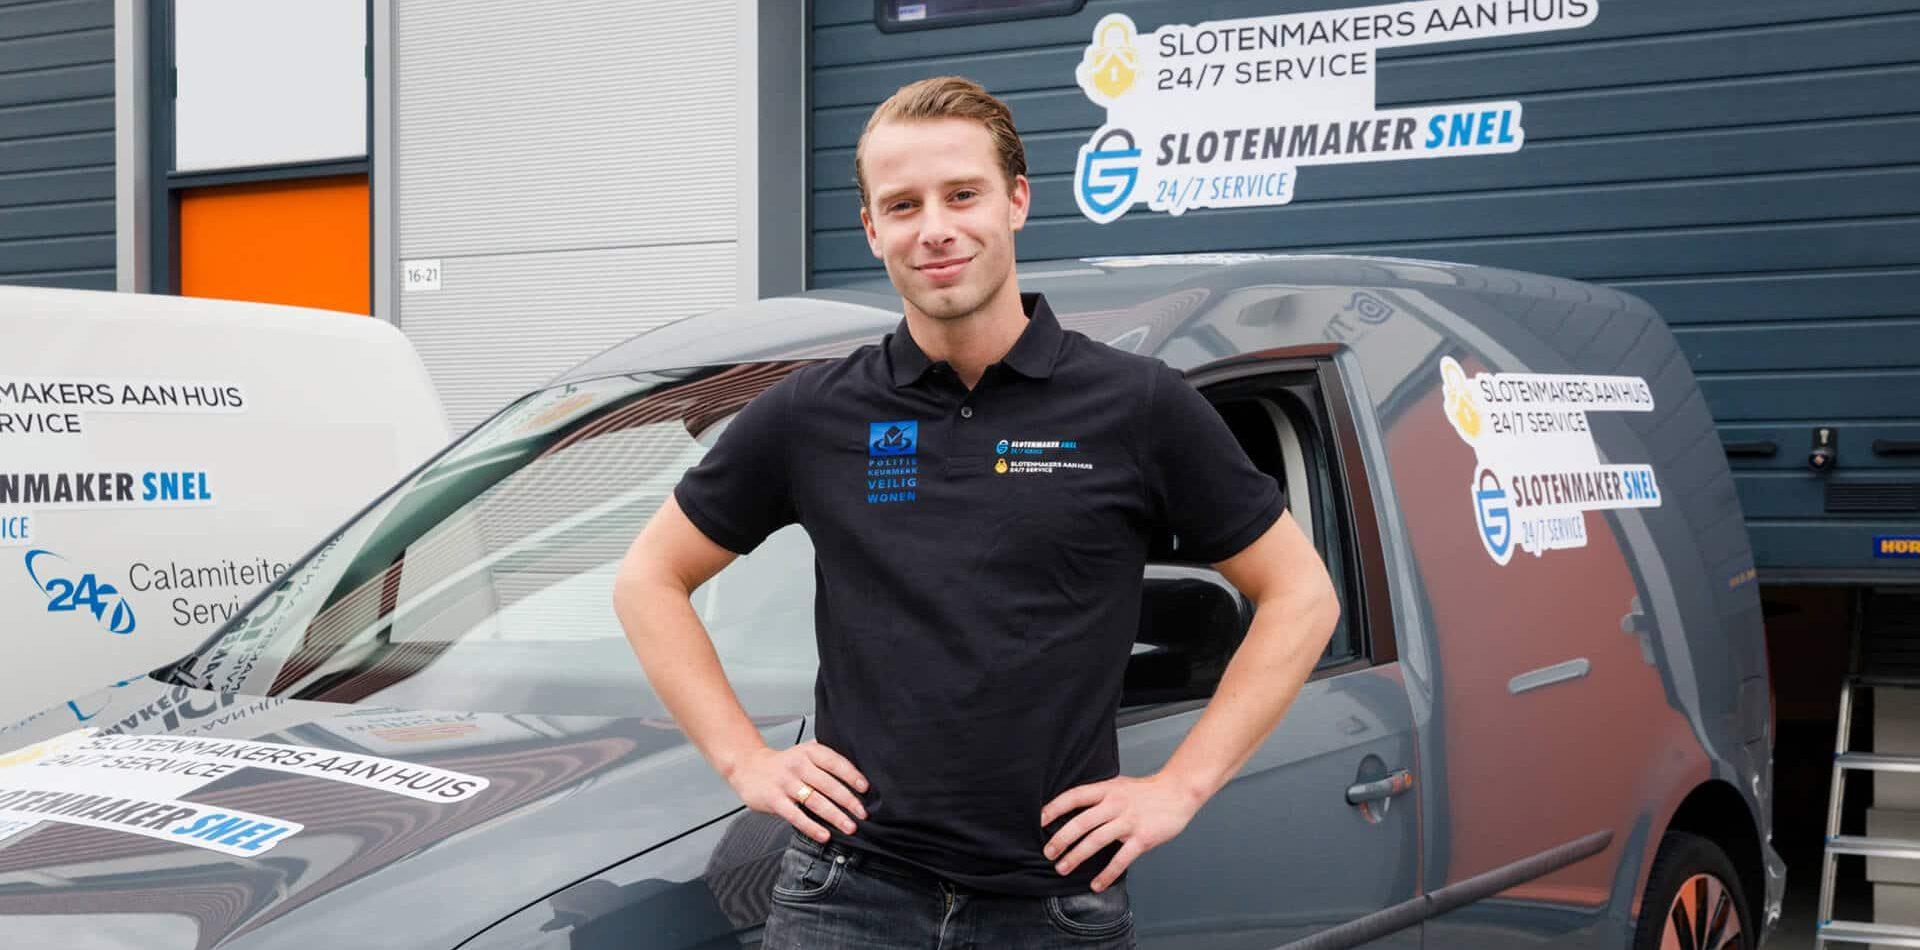 Slotenmaker Zaltbommel